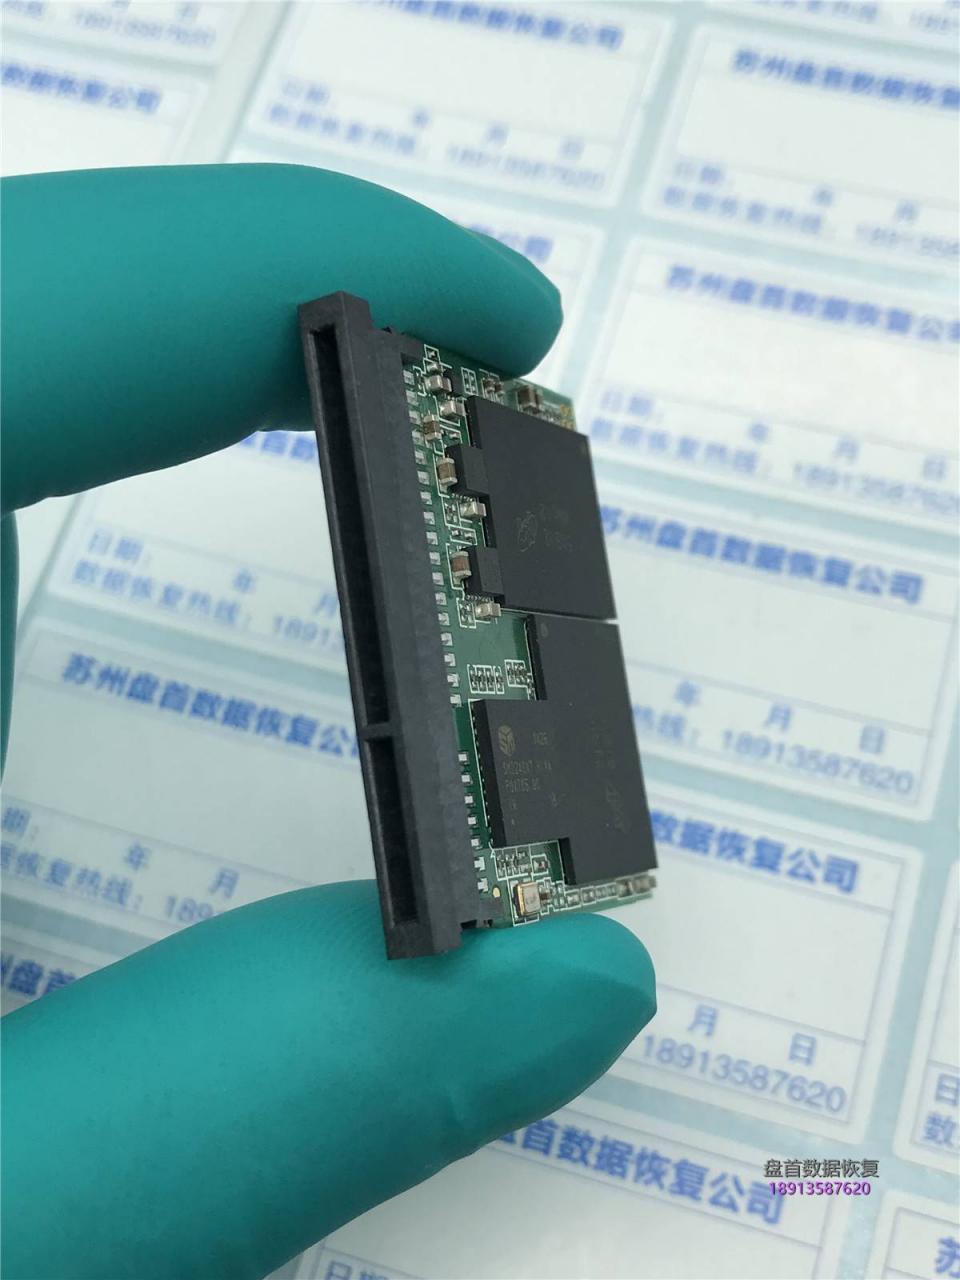 Lexar 雷克沙Professional 3400x CFast 2.0损坏无法识别数据恢复成功